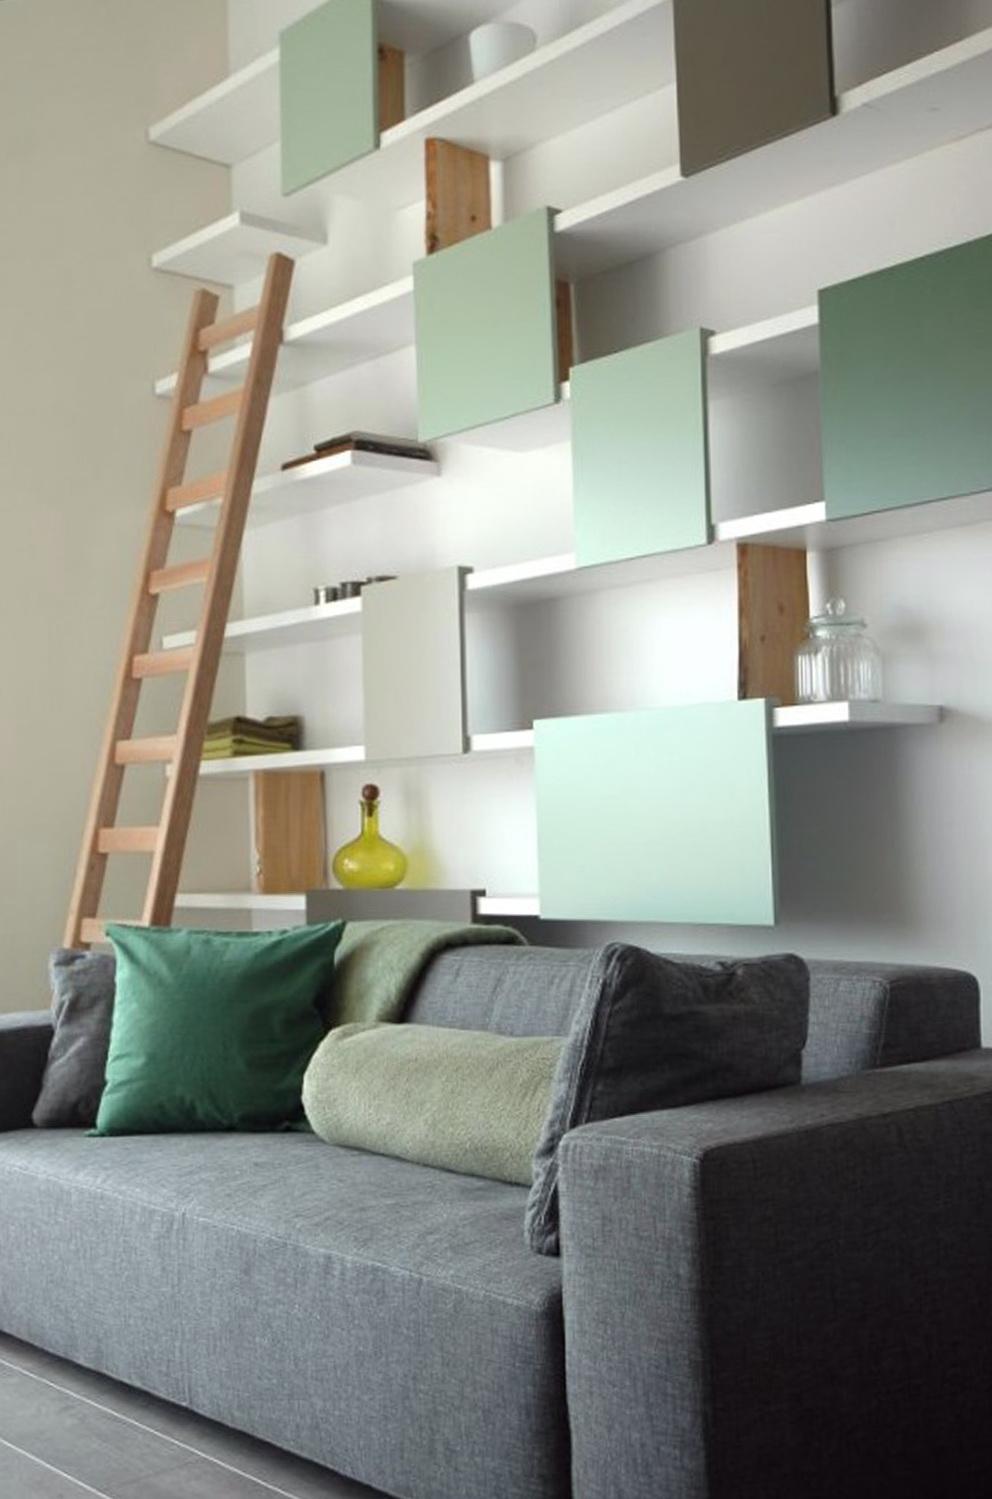 In Wall Shelves Design